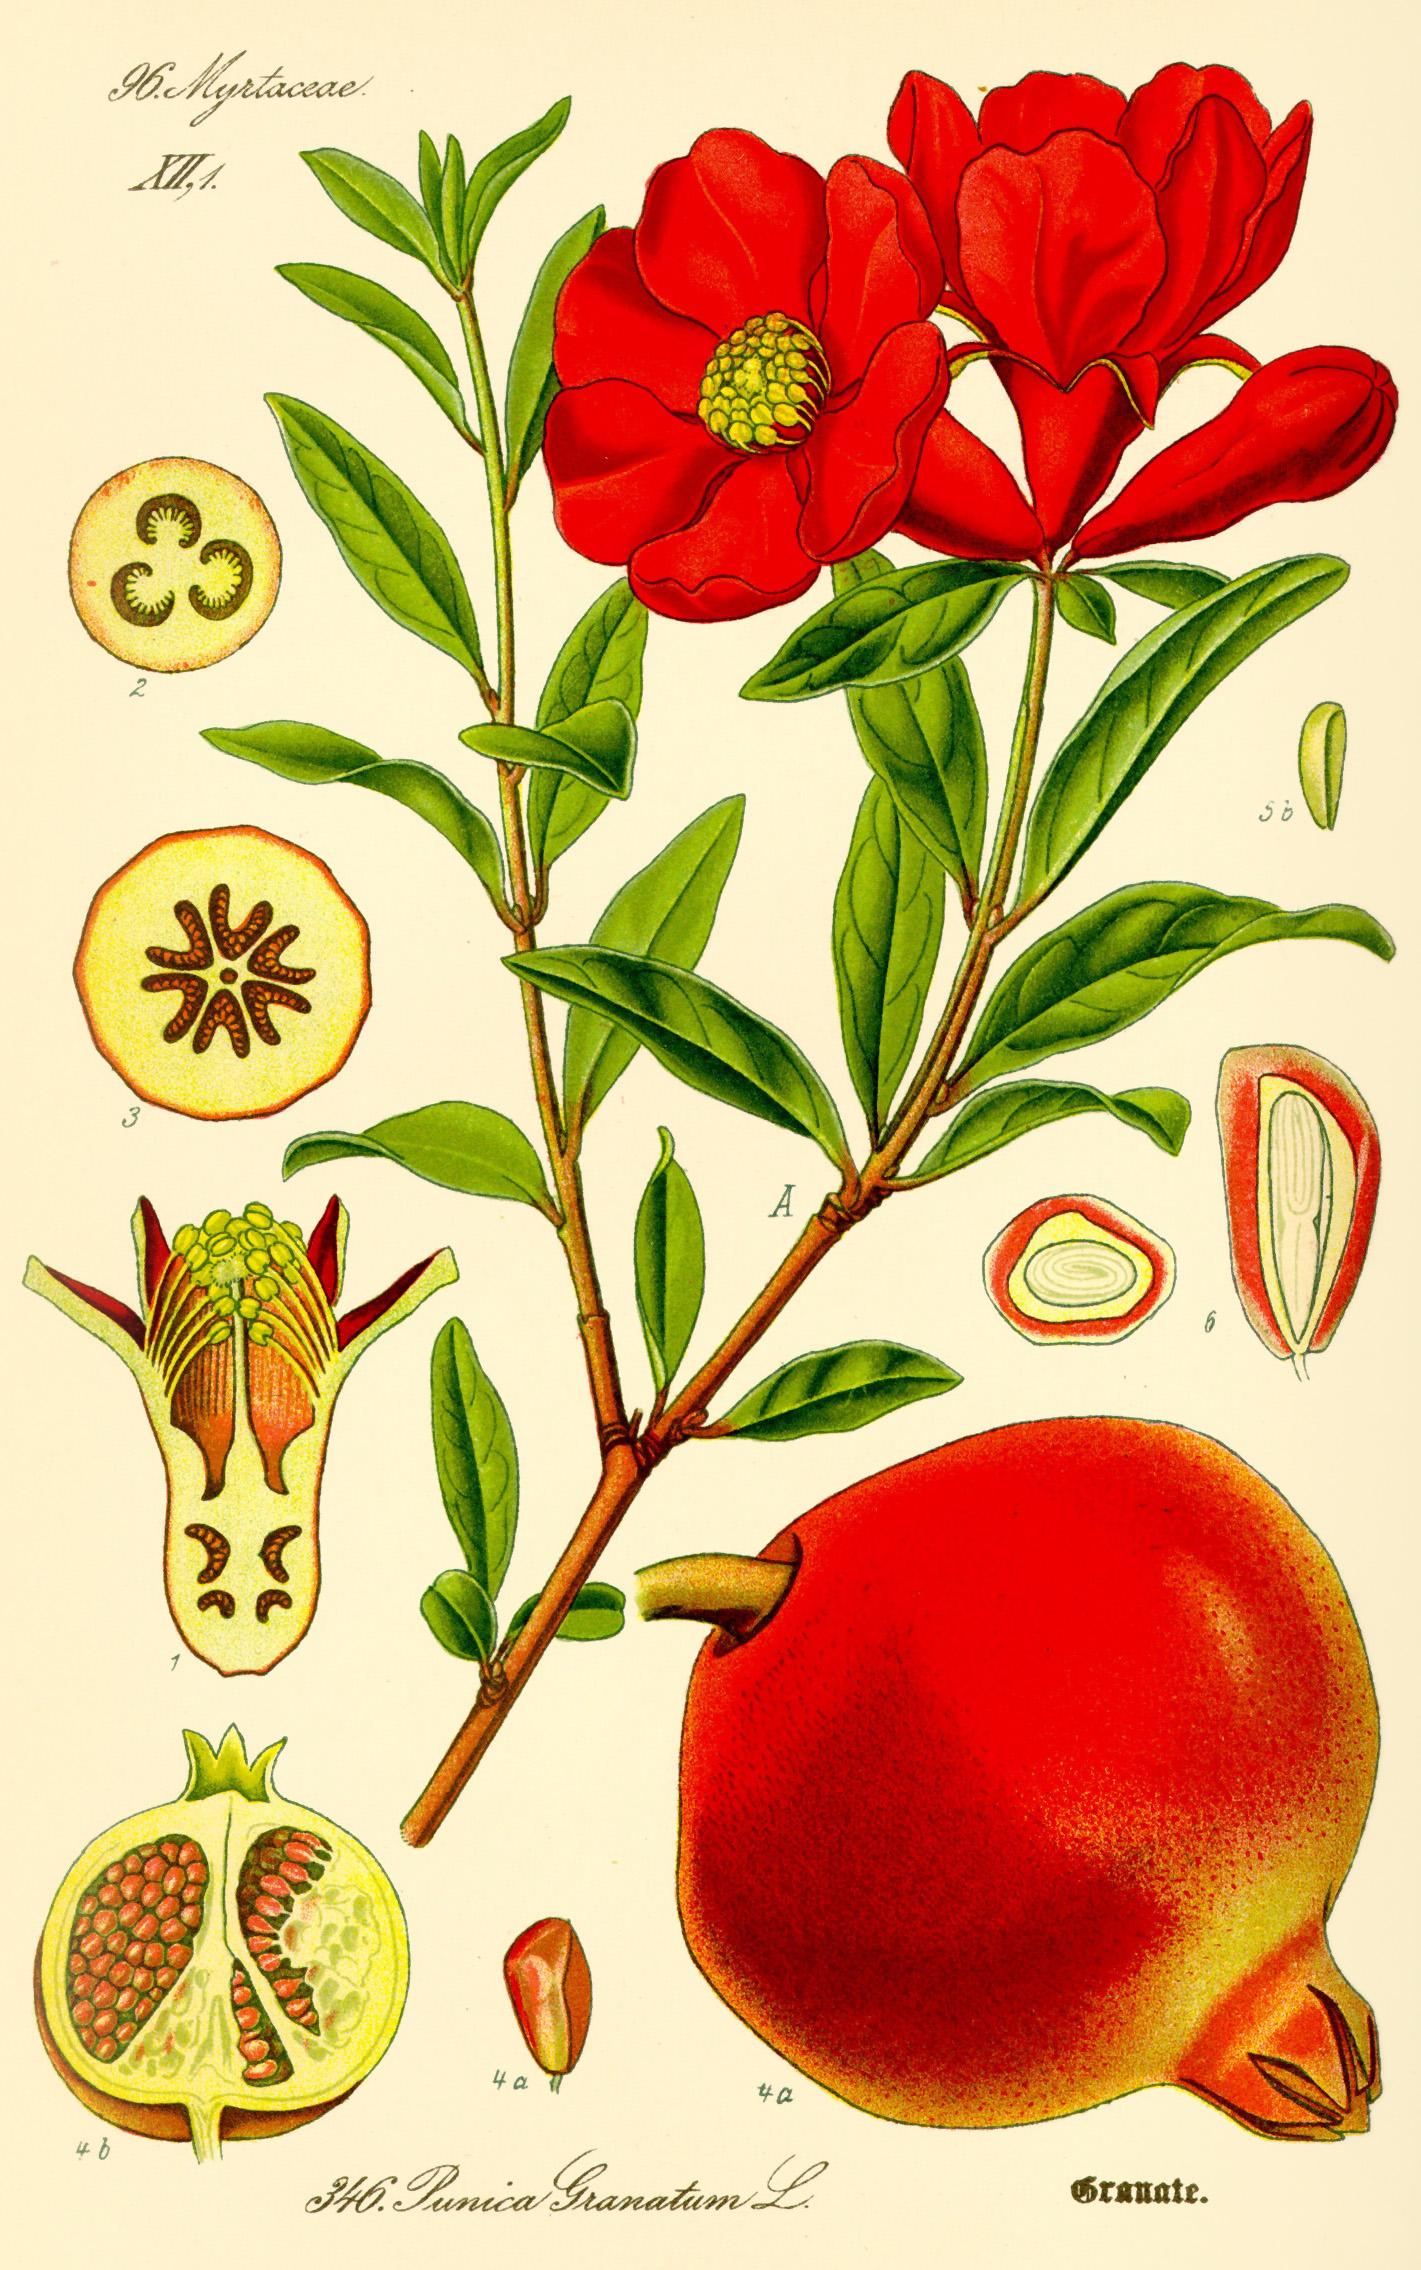 Pomegranate Wikipedia